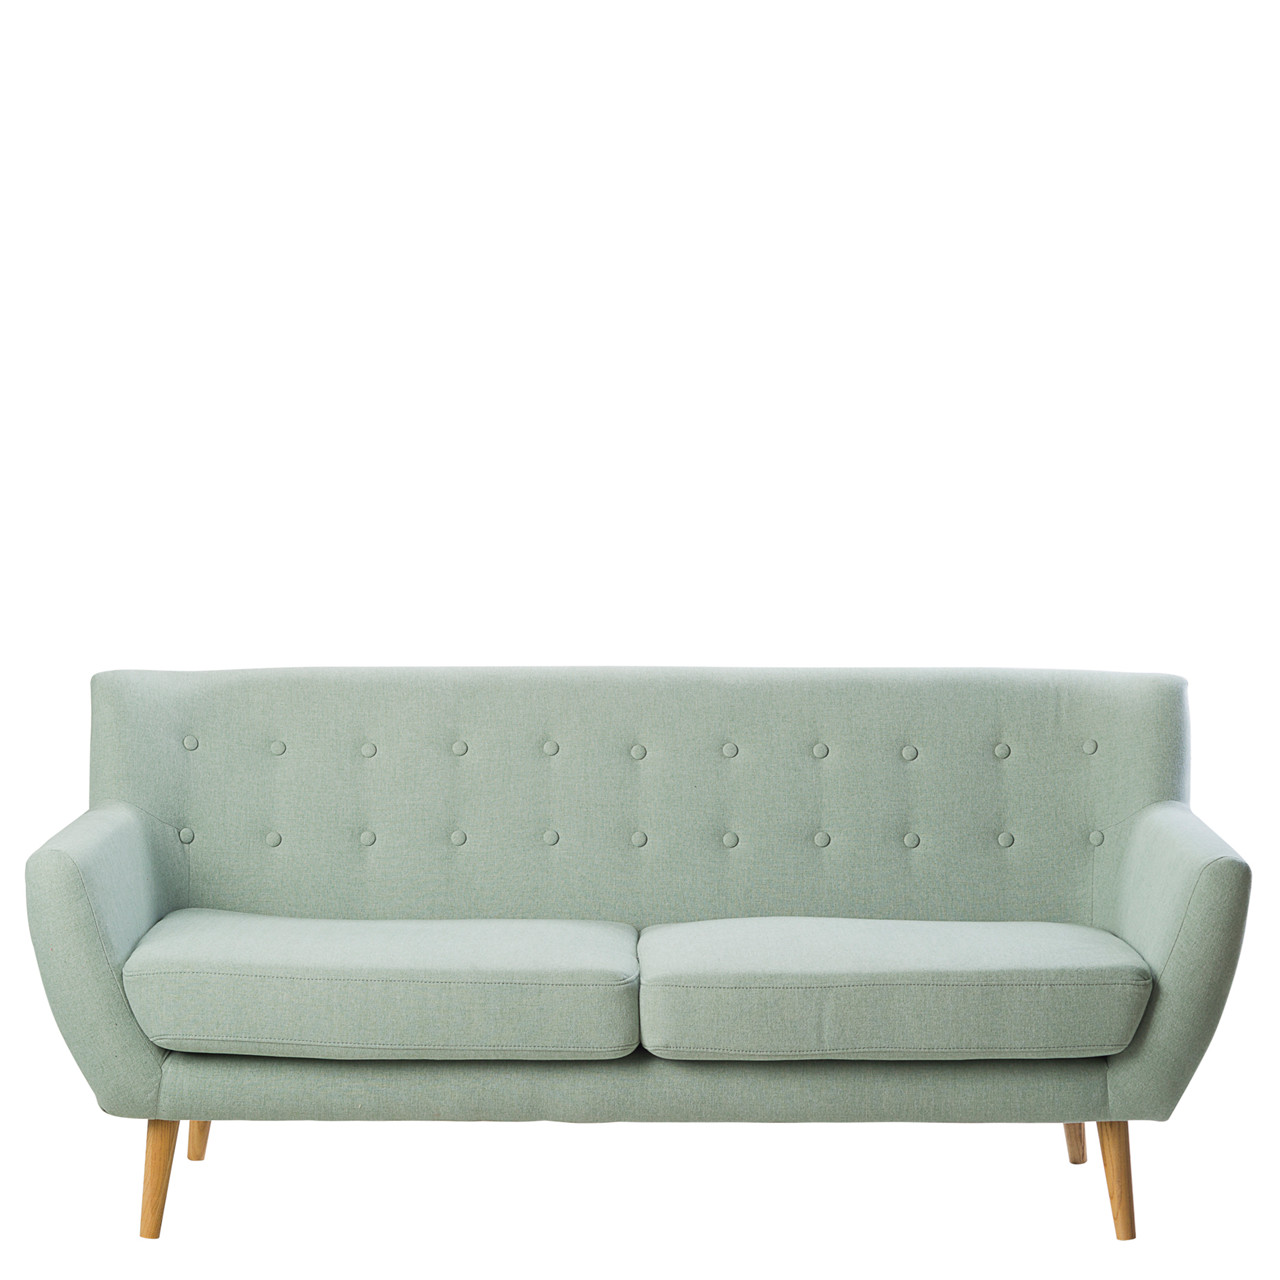 grøn sofa MIAMI 2½ pers. sofa støvet grøn » Køb her grøn sofa